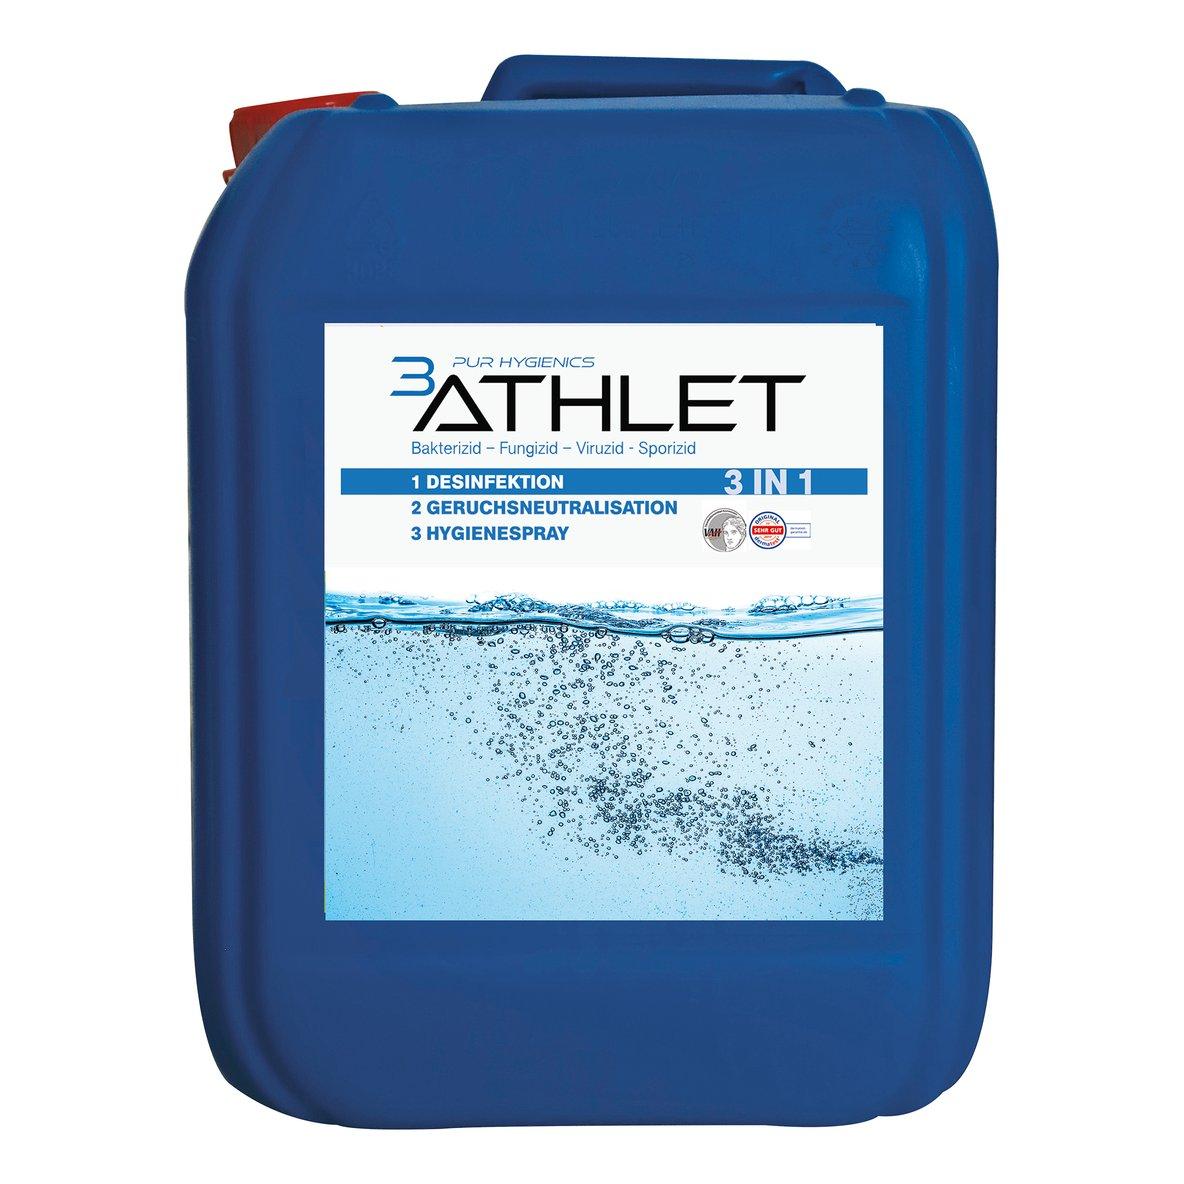 Baktolin pure, Waschlotion 500 ml